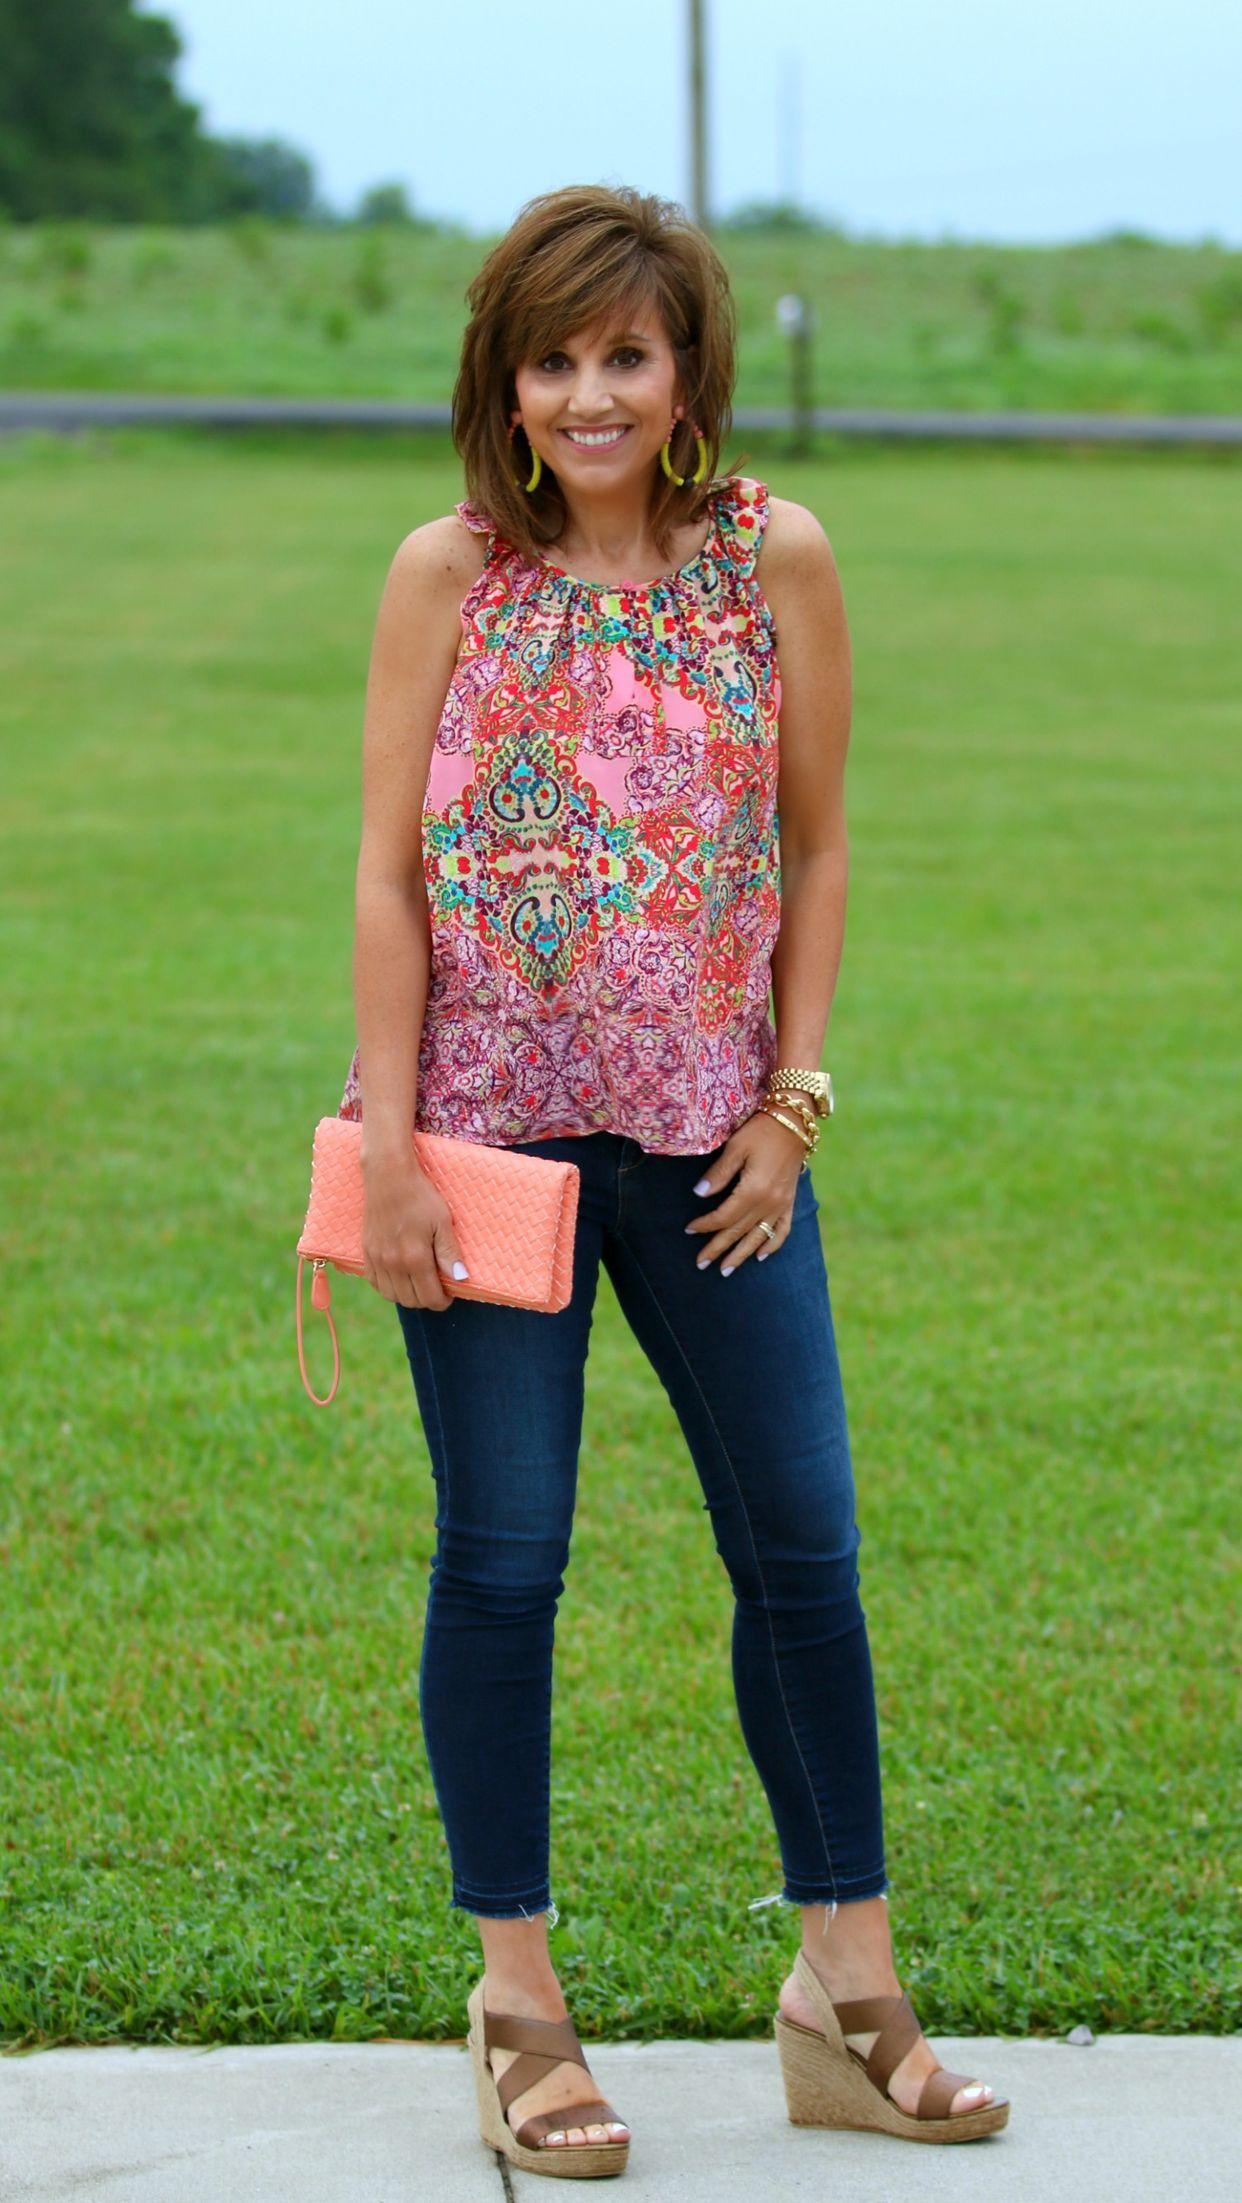 35f3a20b57a3 22 Days of Summer Fashion-Stitch Fix Giveaway (Cyndi Spivey ...